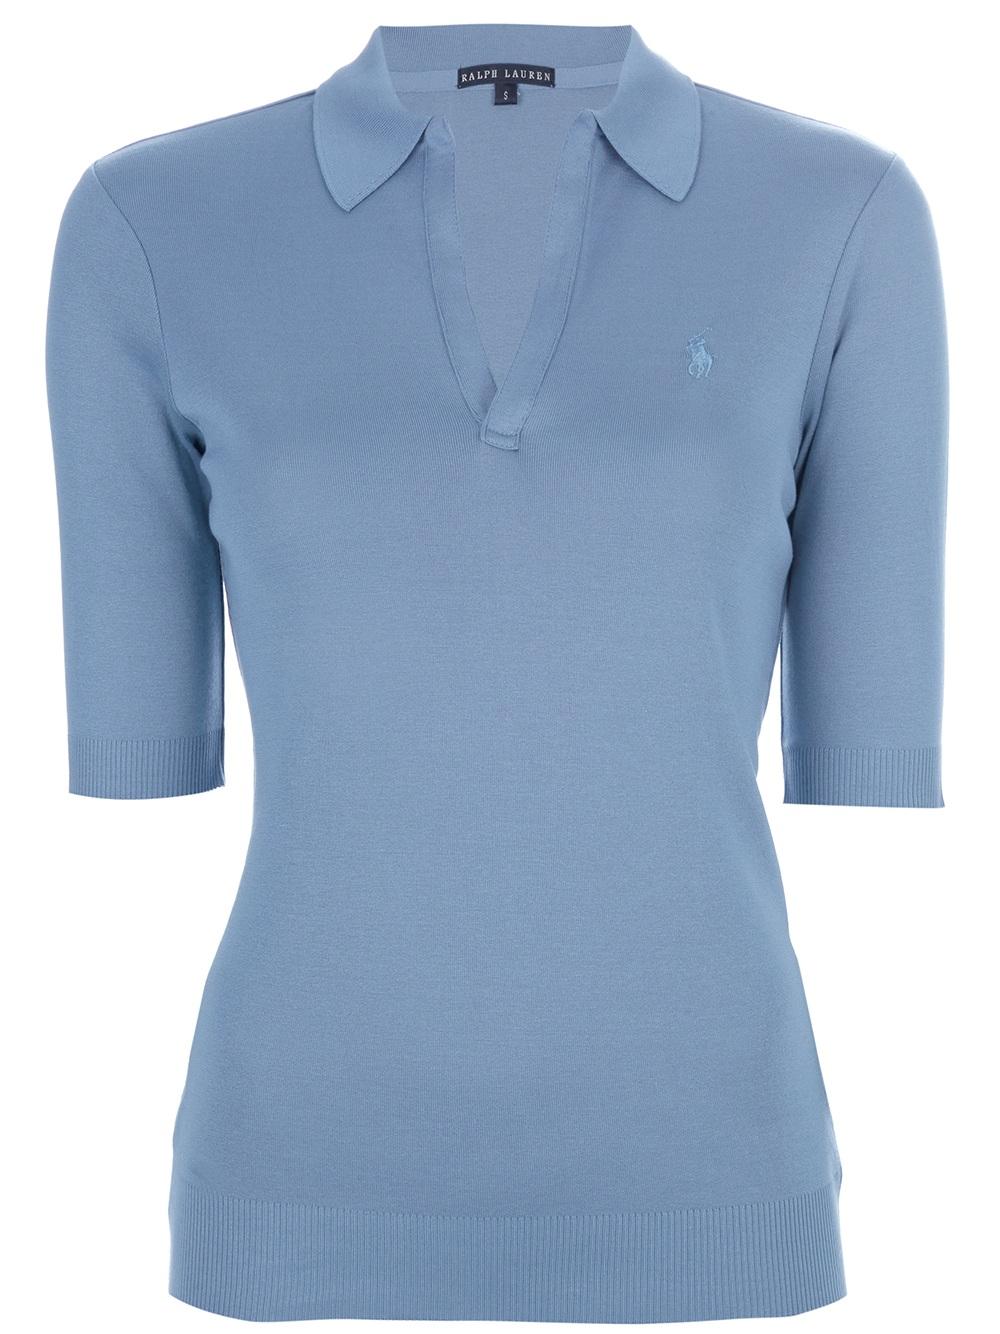 Ralph lauren black label classic polo shirt in blue lyst for Ralph lauren black label polo shirt